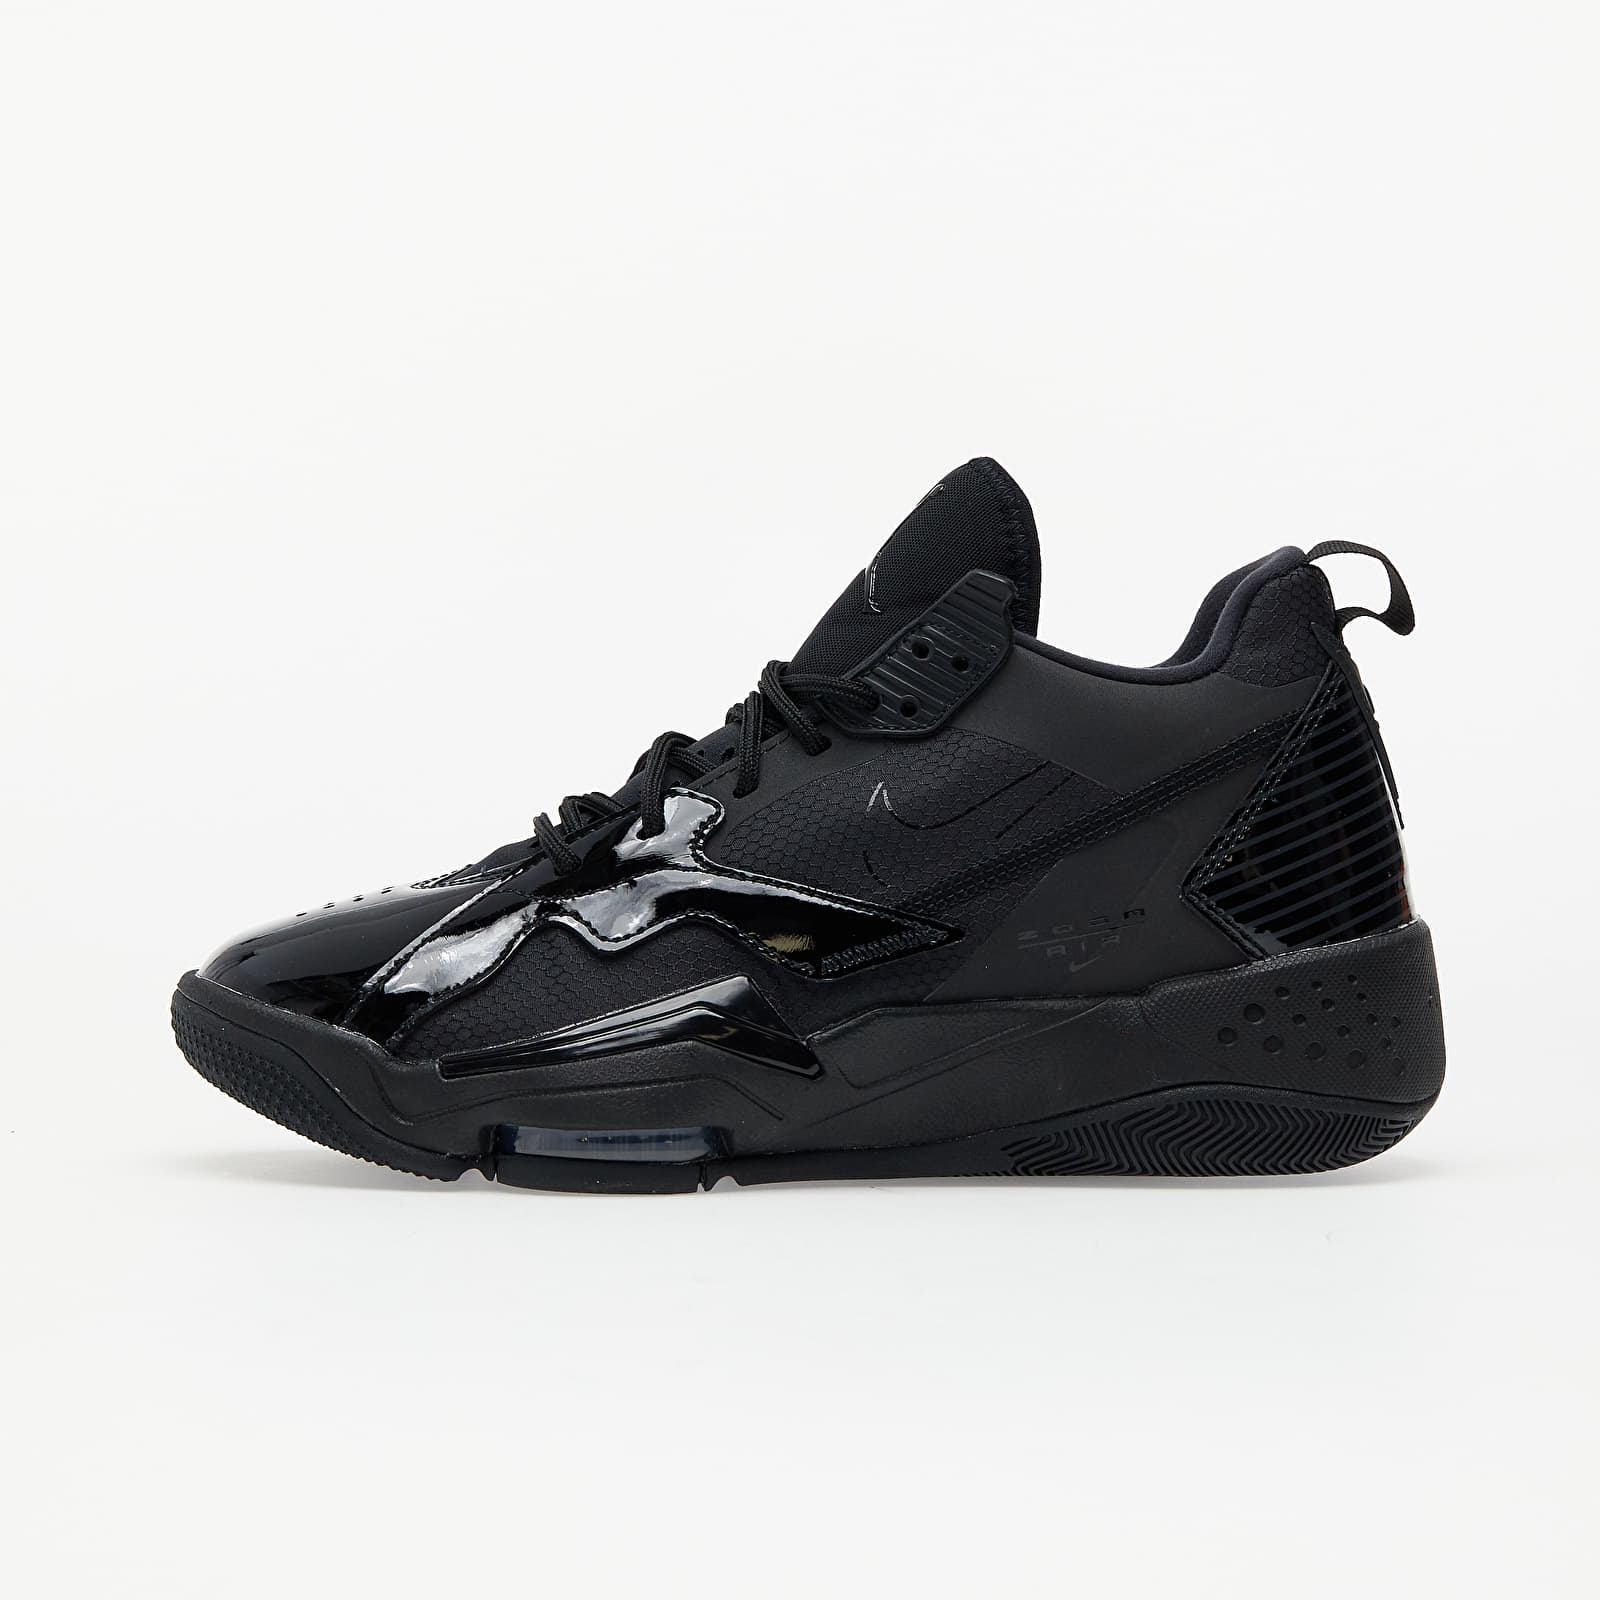 Jordan Zoom '92 Black/ Black CK9183-002